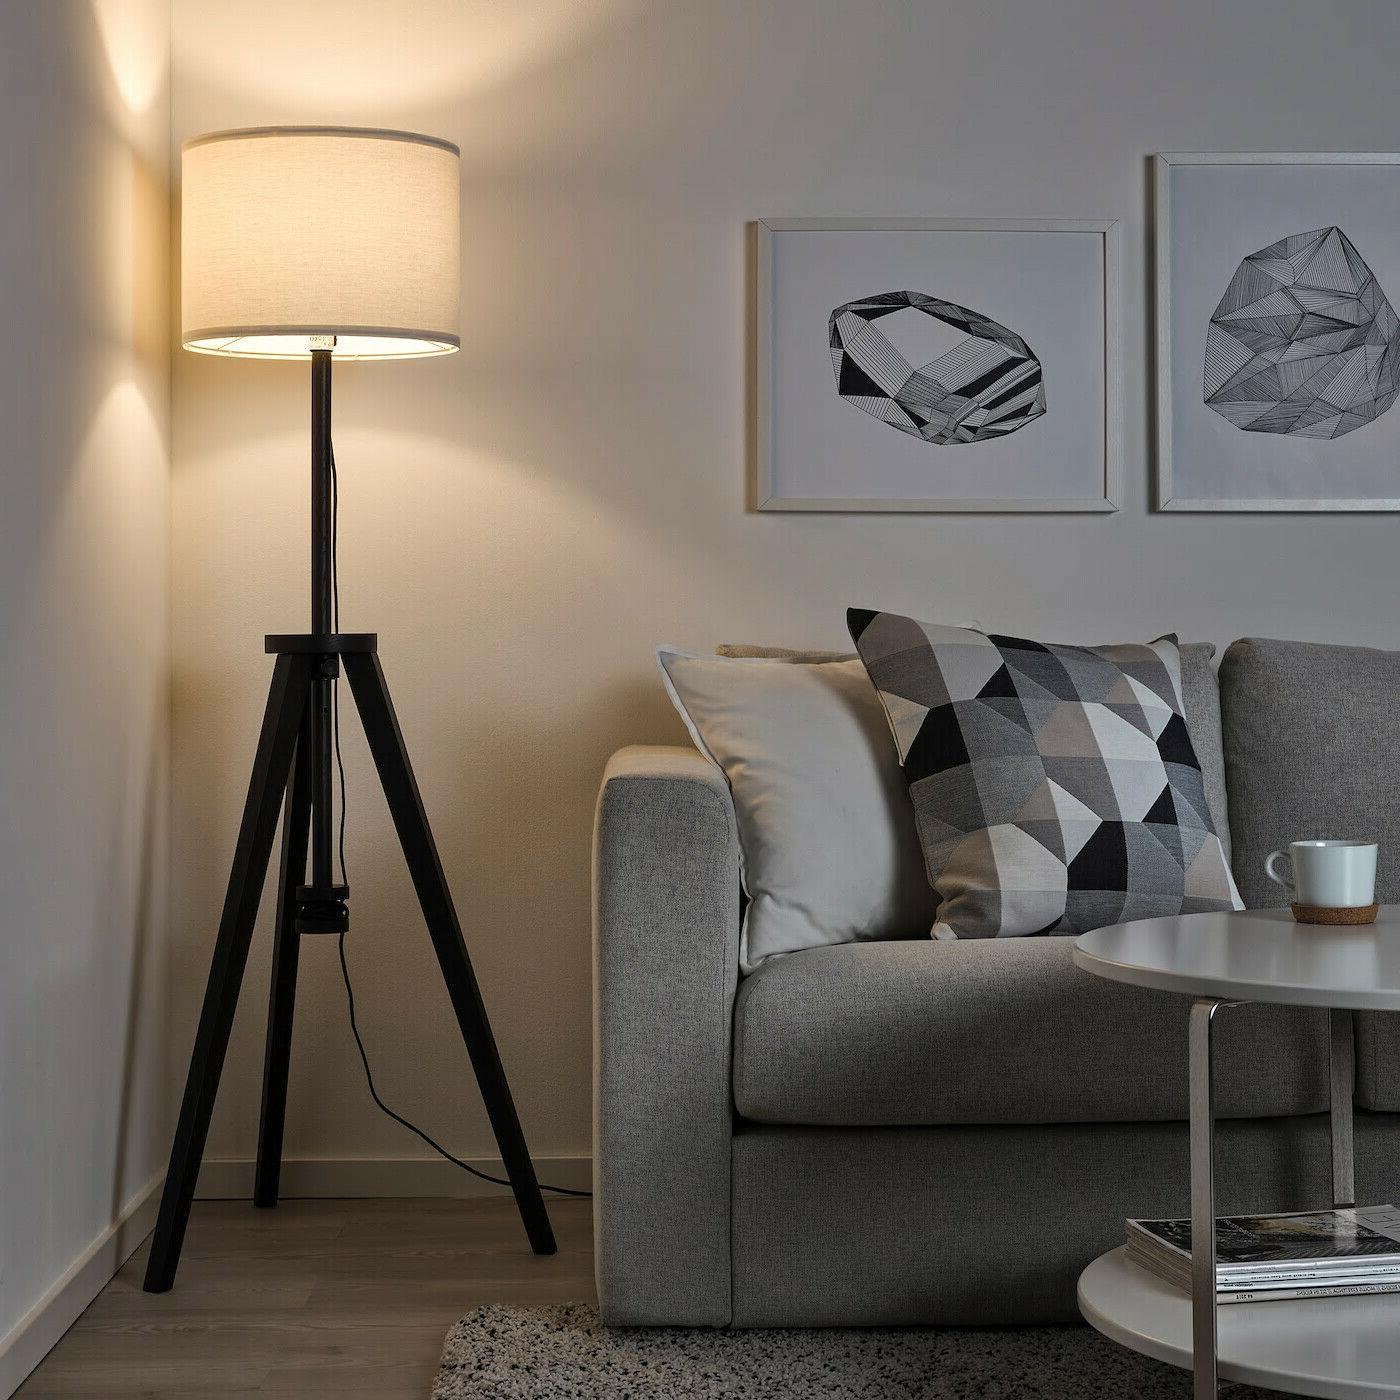 Lauters Ikea Table Lamp